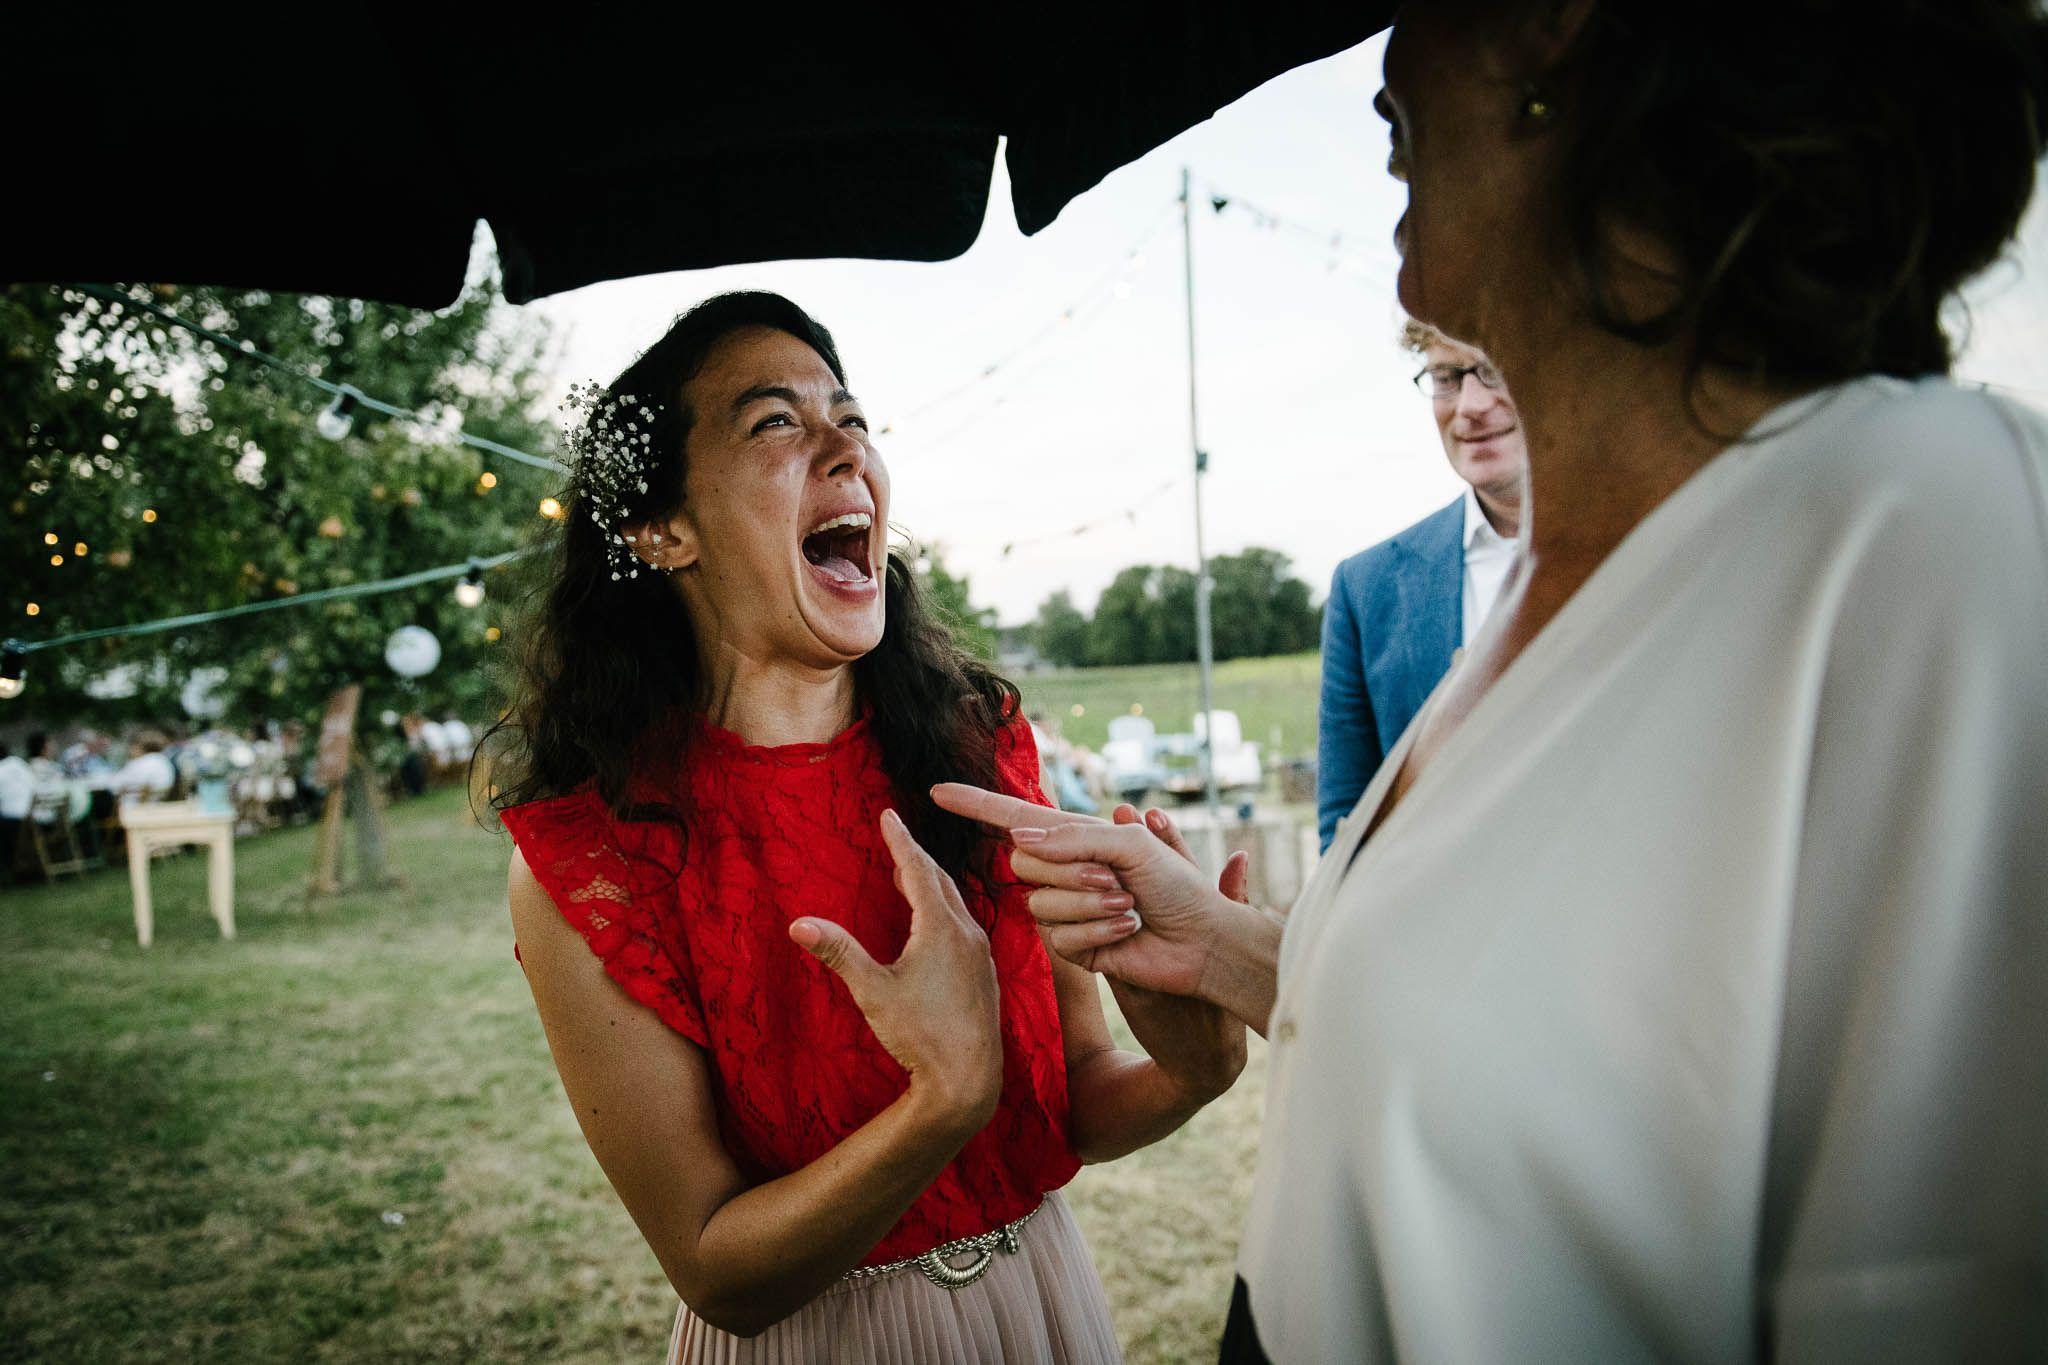 bohemian bruiloft festival stijl